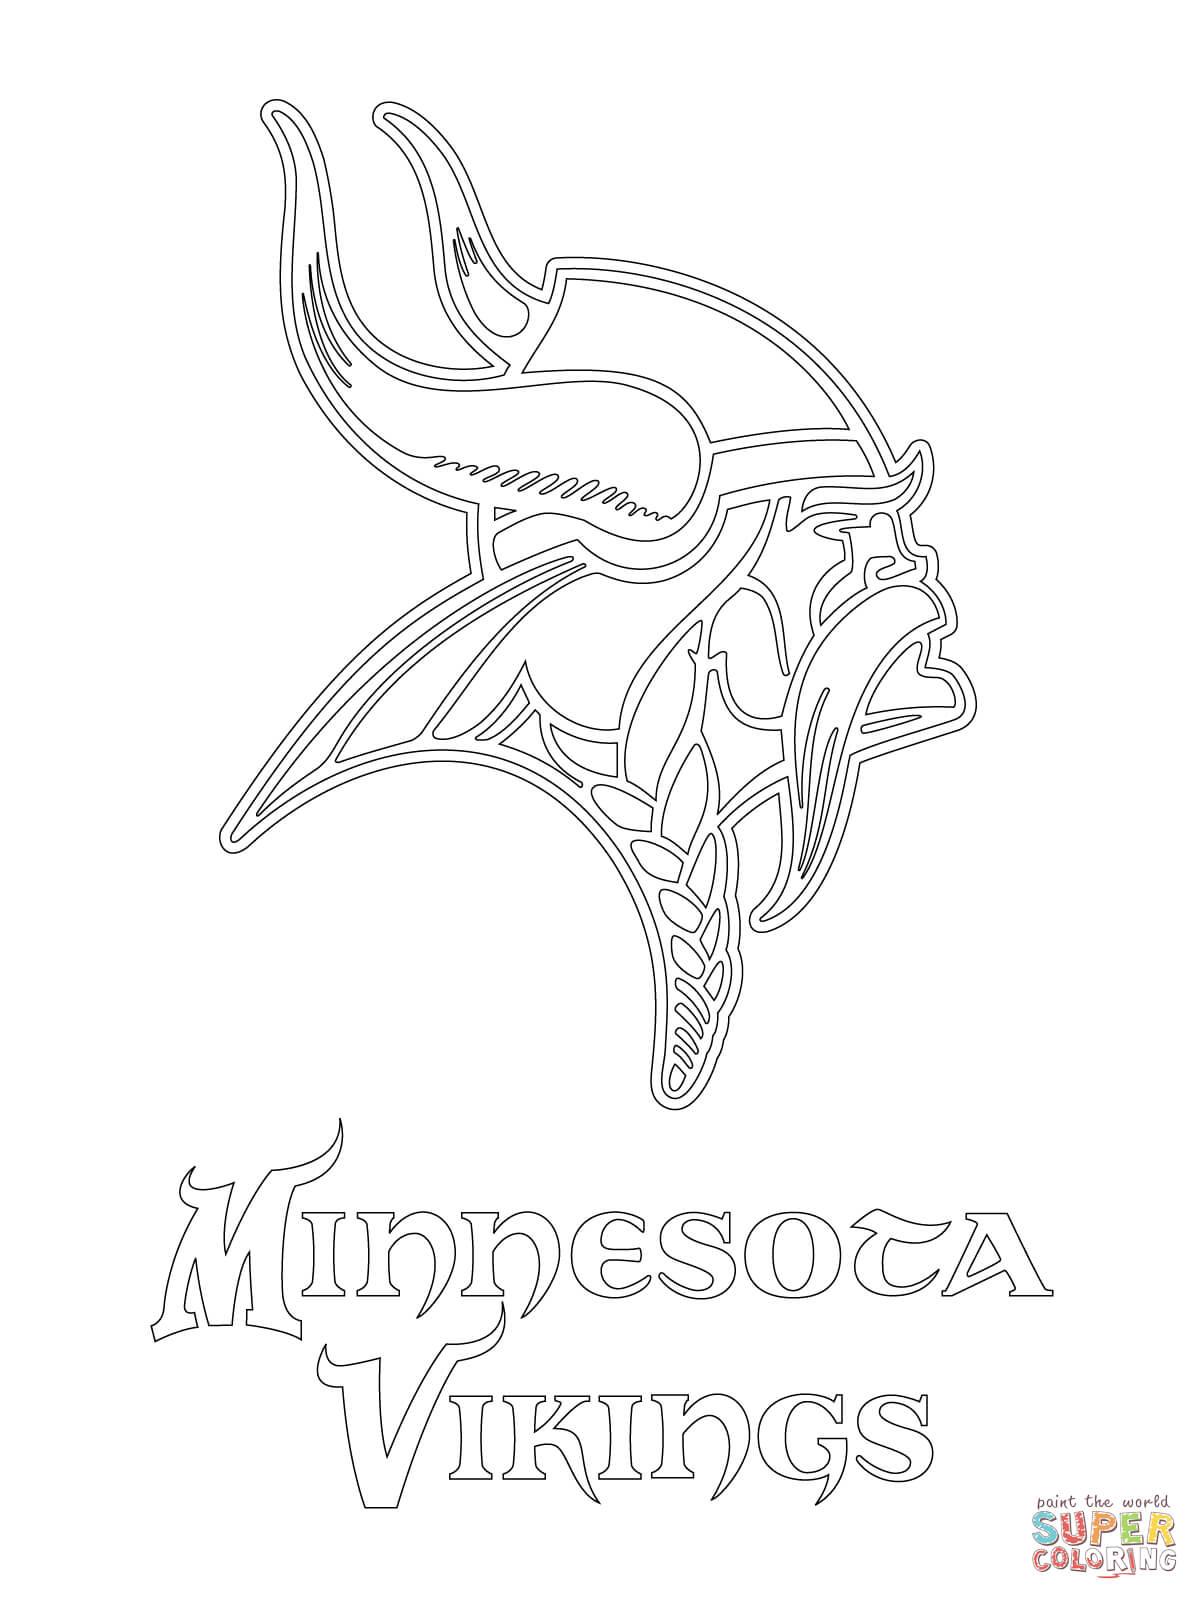 Minnesota Vikings Logo coloring page | Free Printable ...